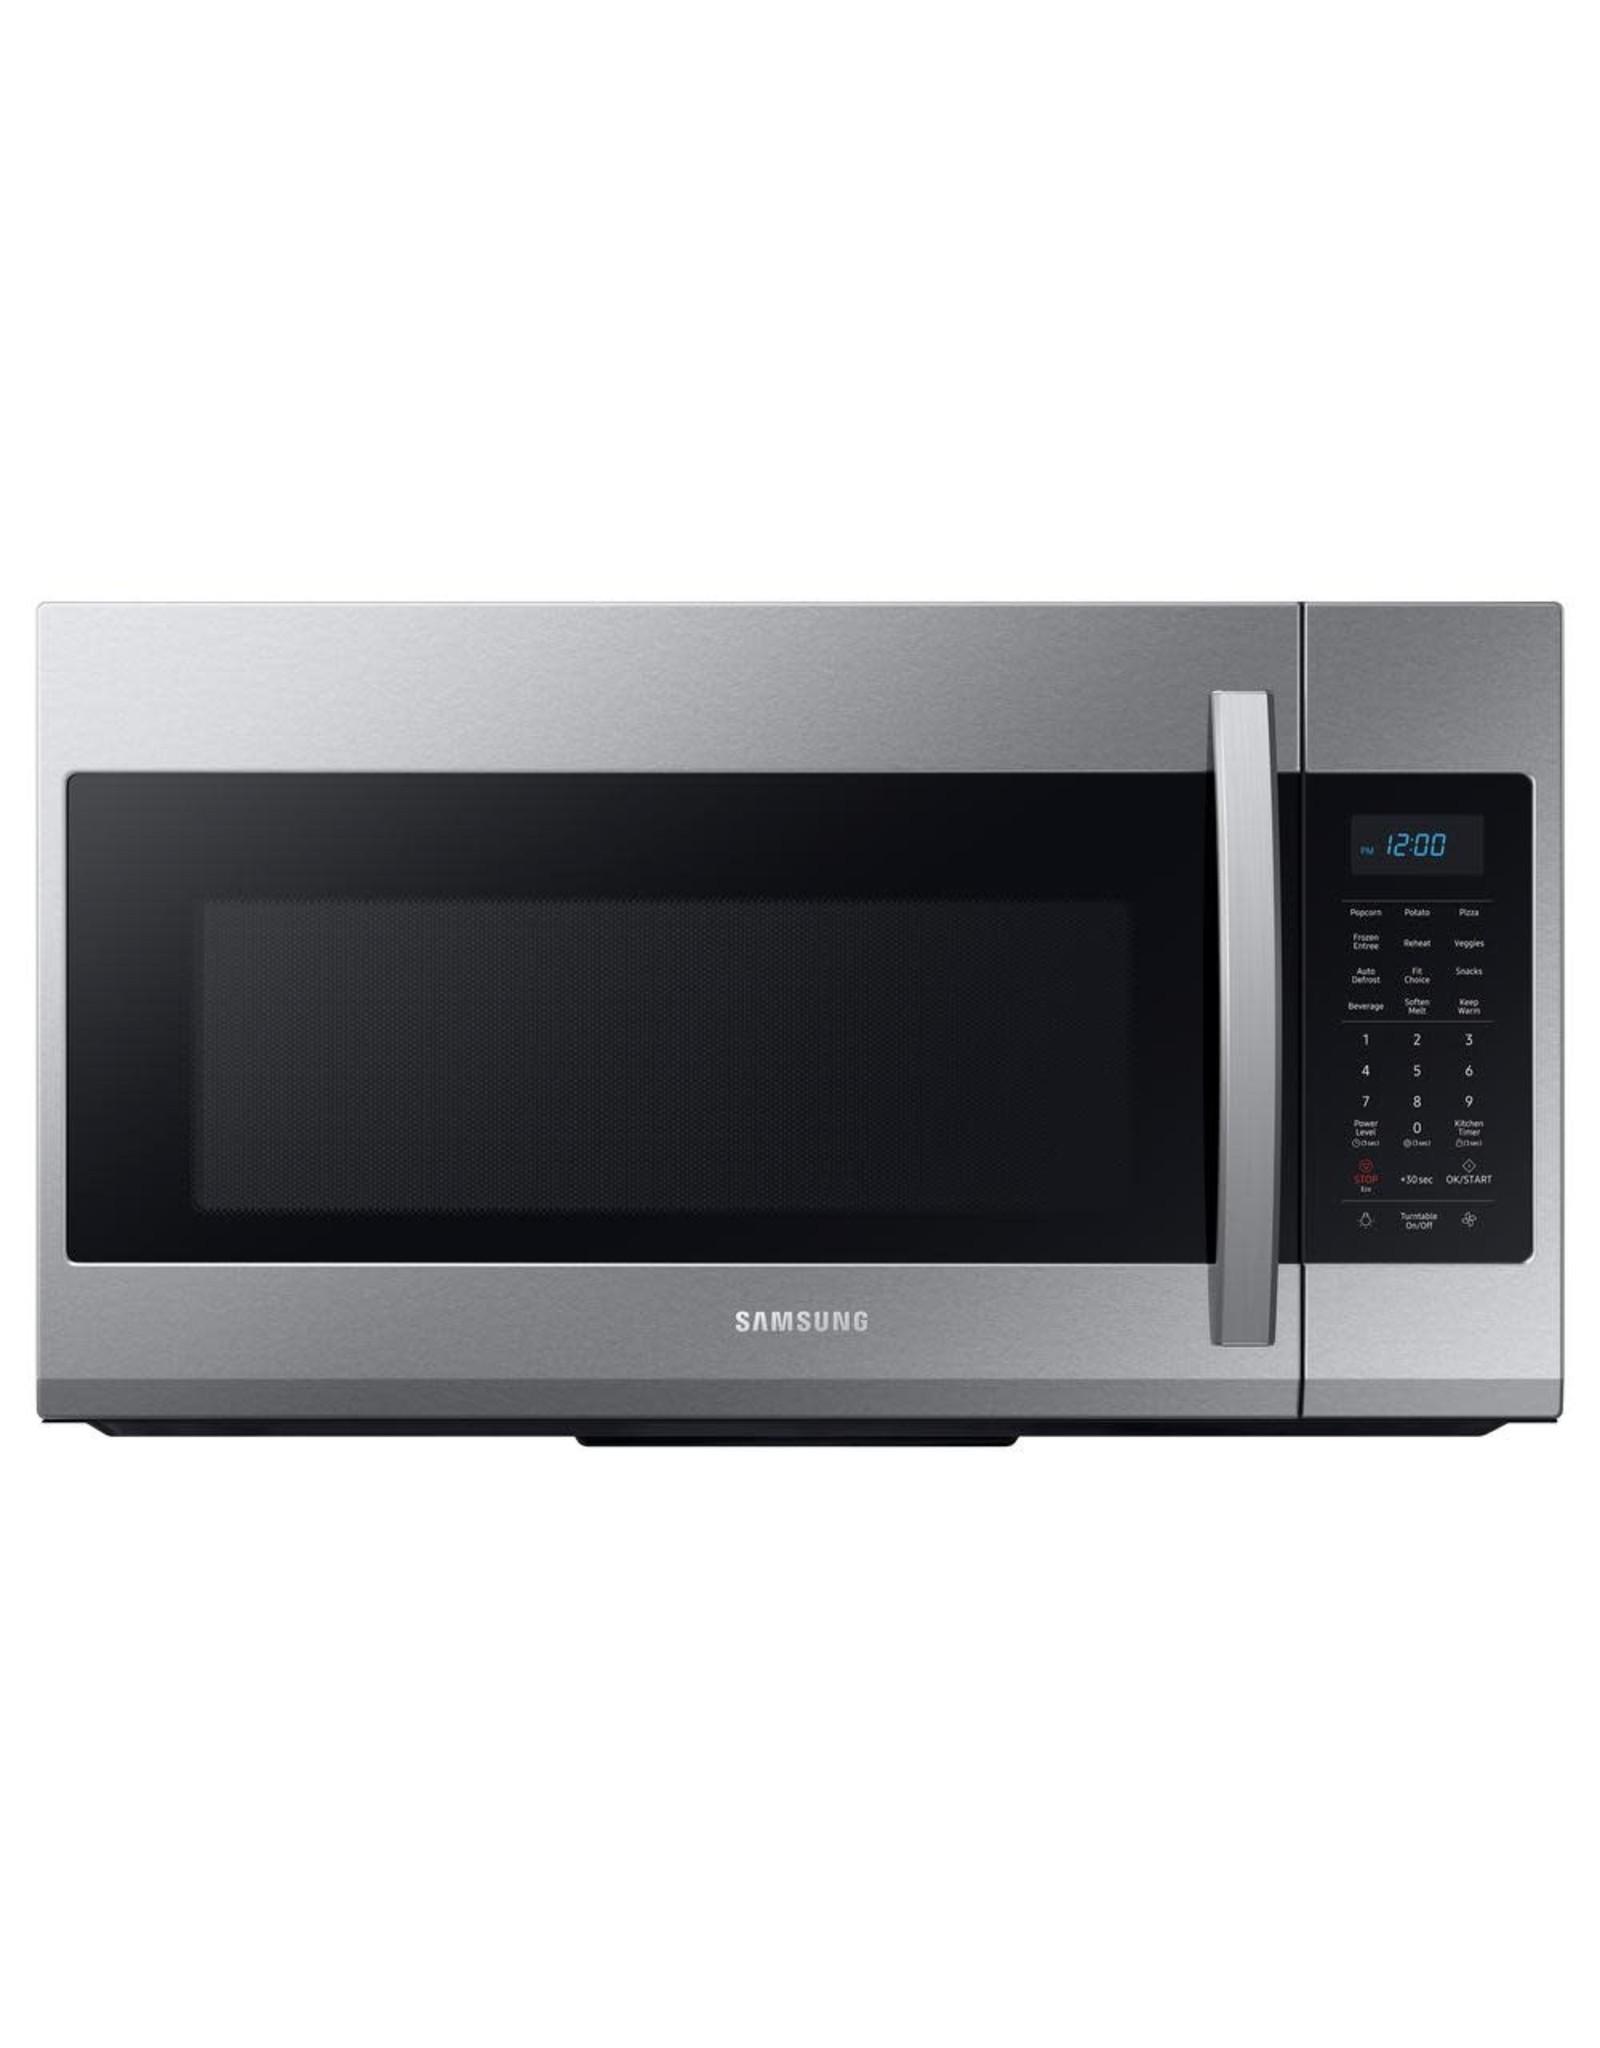 SAMSUNG Samsung 30 in. 1.9 cu. ft. Over-the-Range Microwave in Fingerprint Resistant Stainless Steel